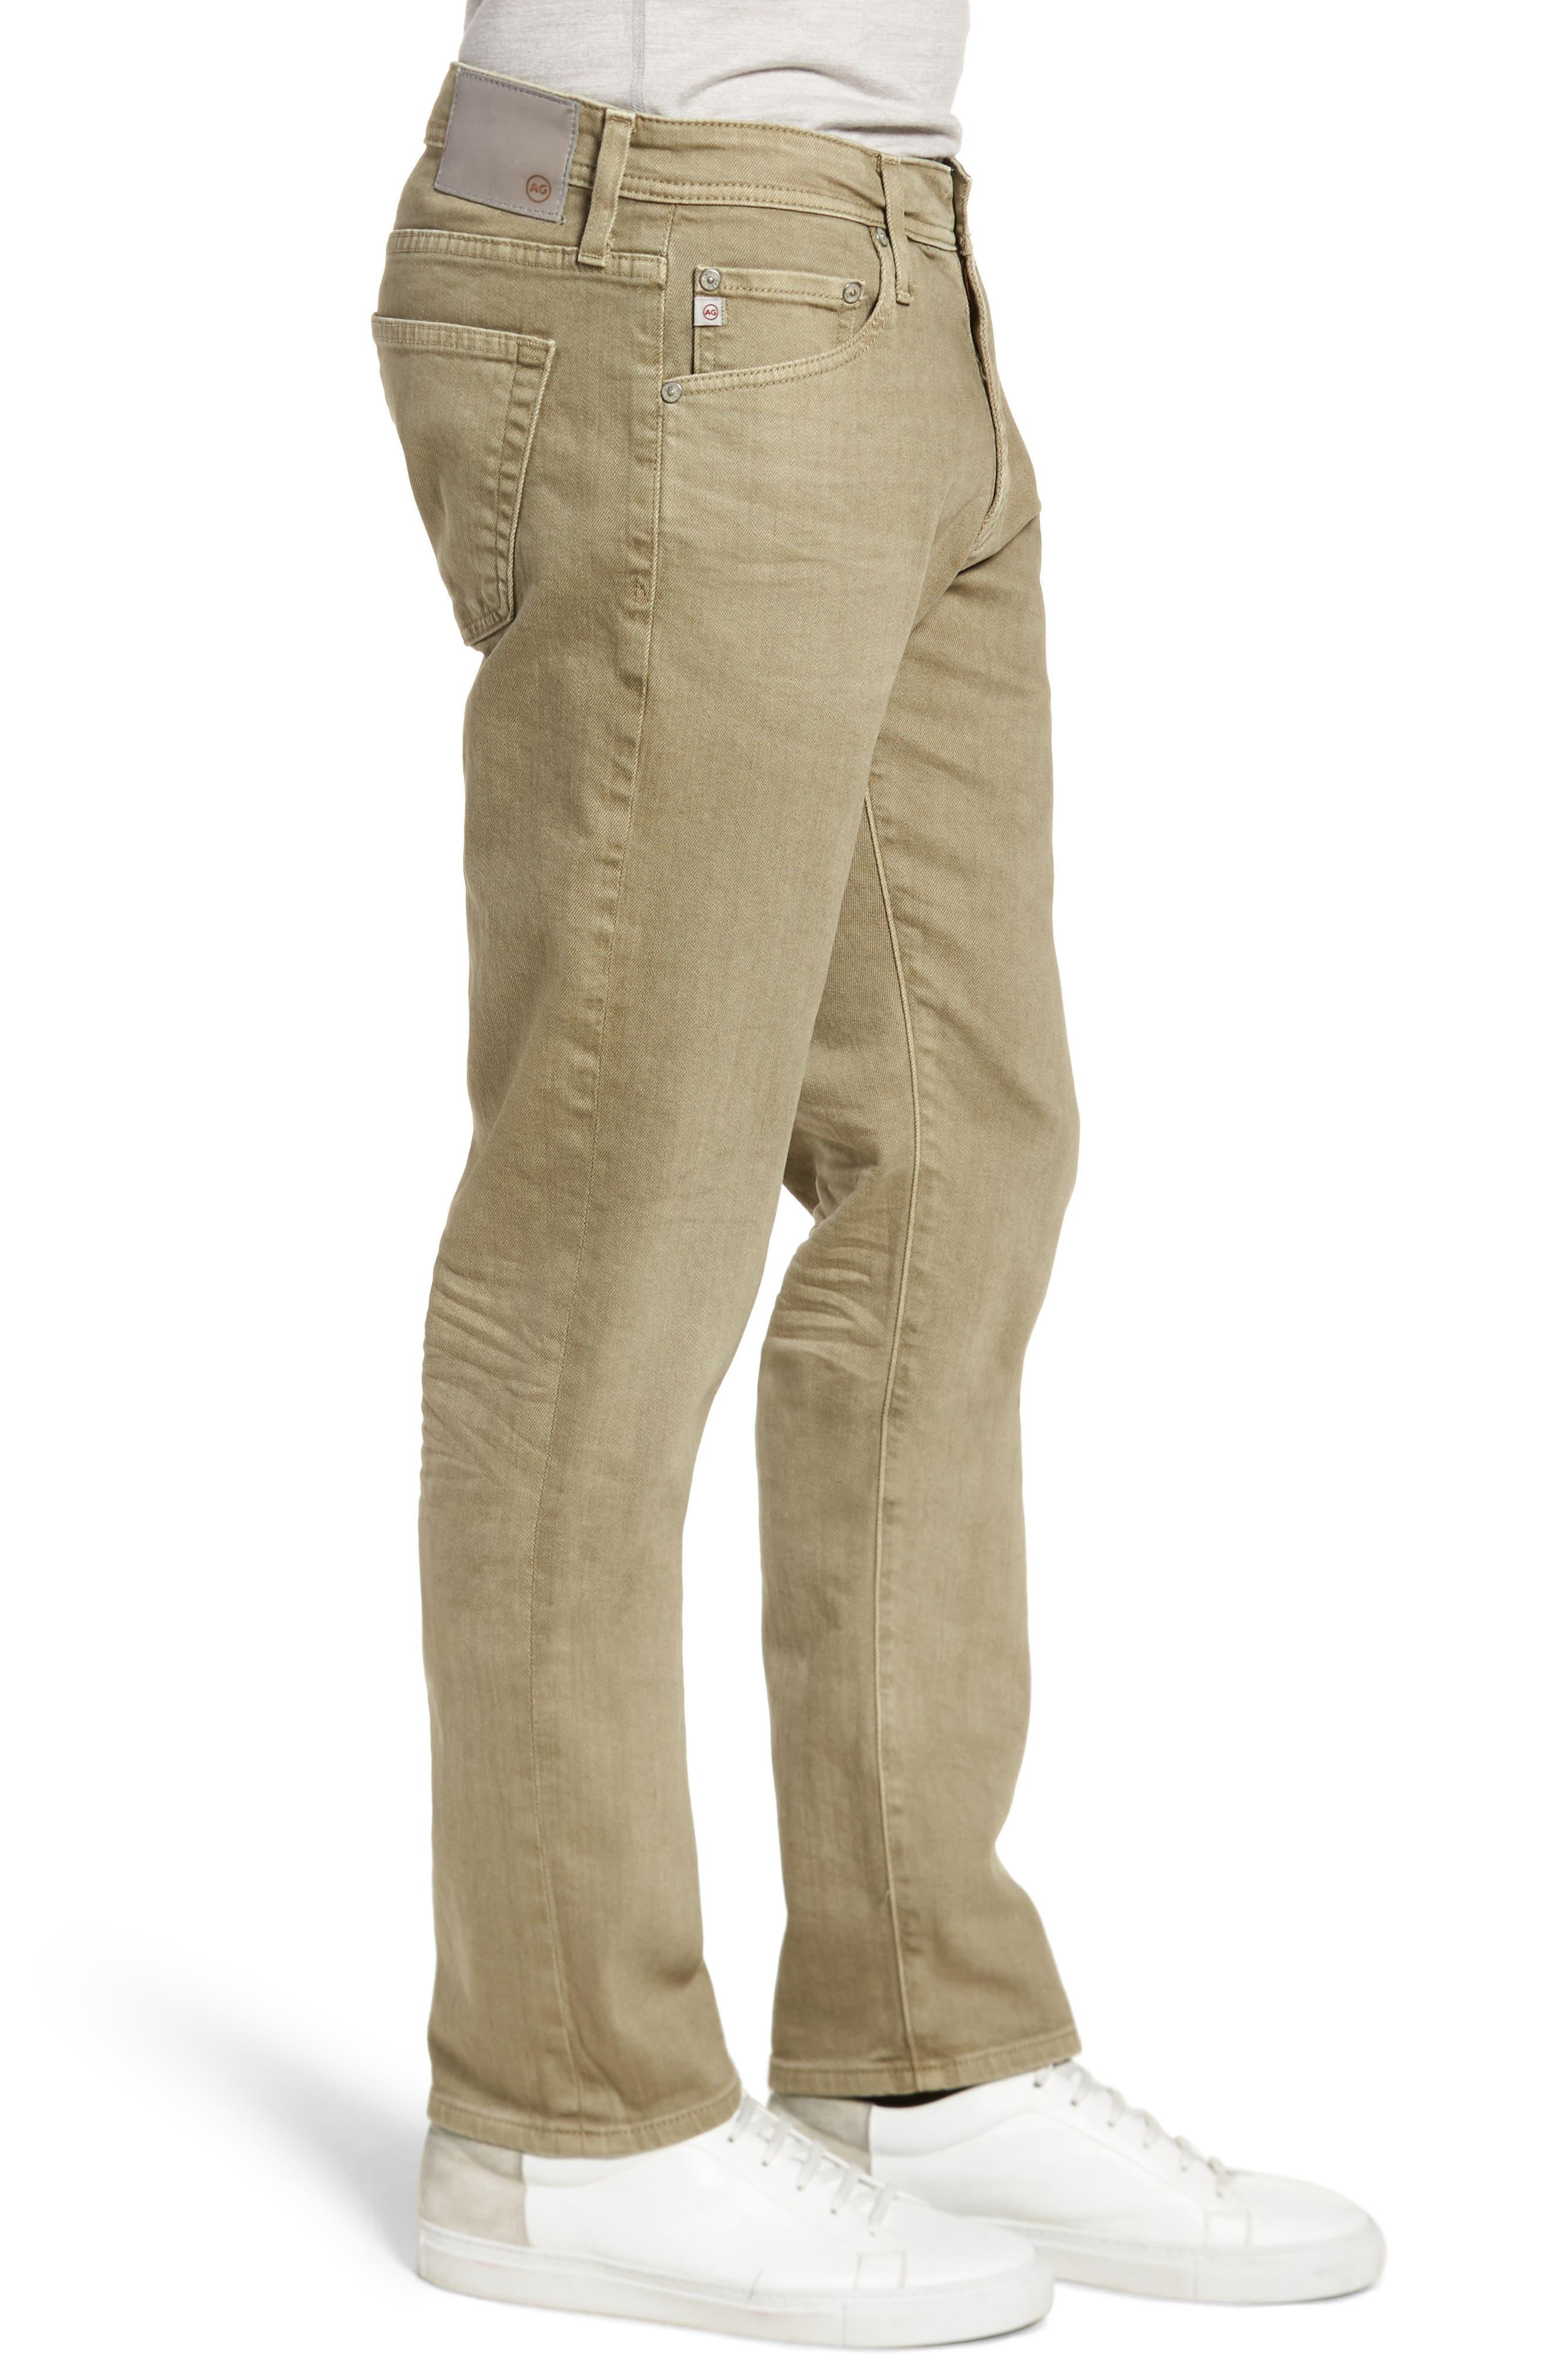 Tellis Slim Fit Jeans,                             Alternate thumbnail 3, color,                             316